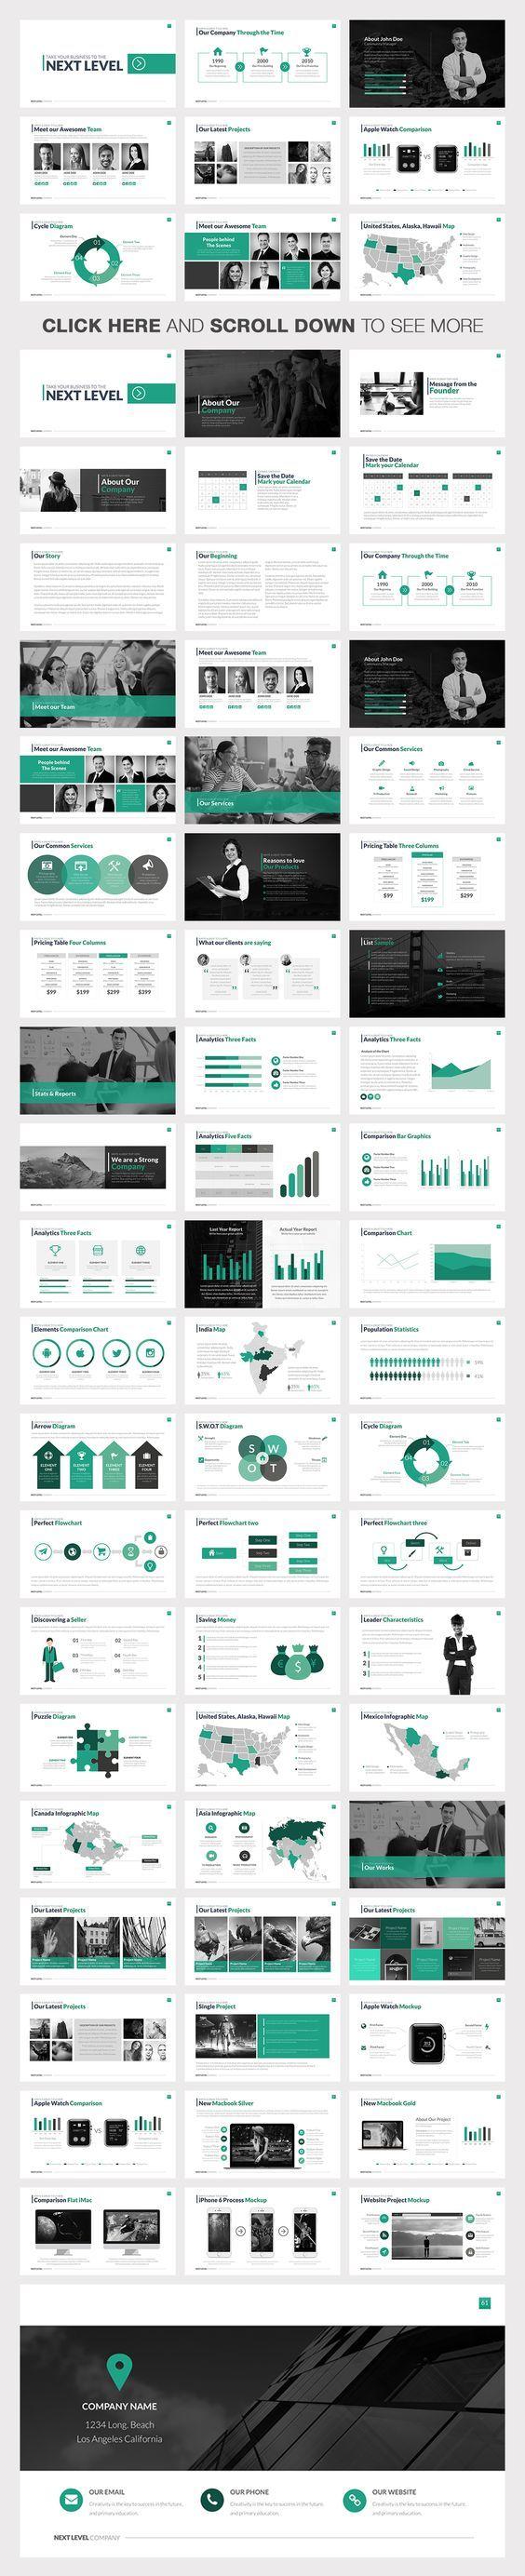 Next Level Powerpoint Template by Slidedizer on Creative Market: